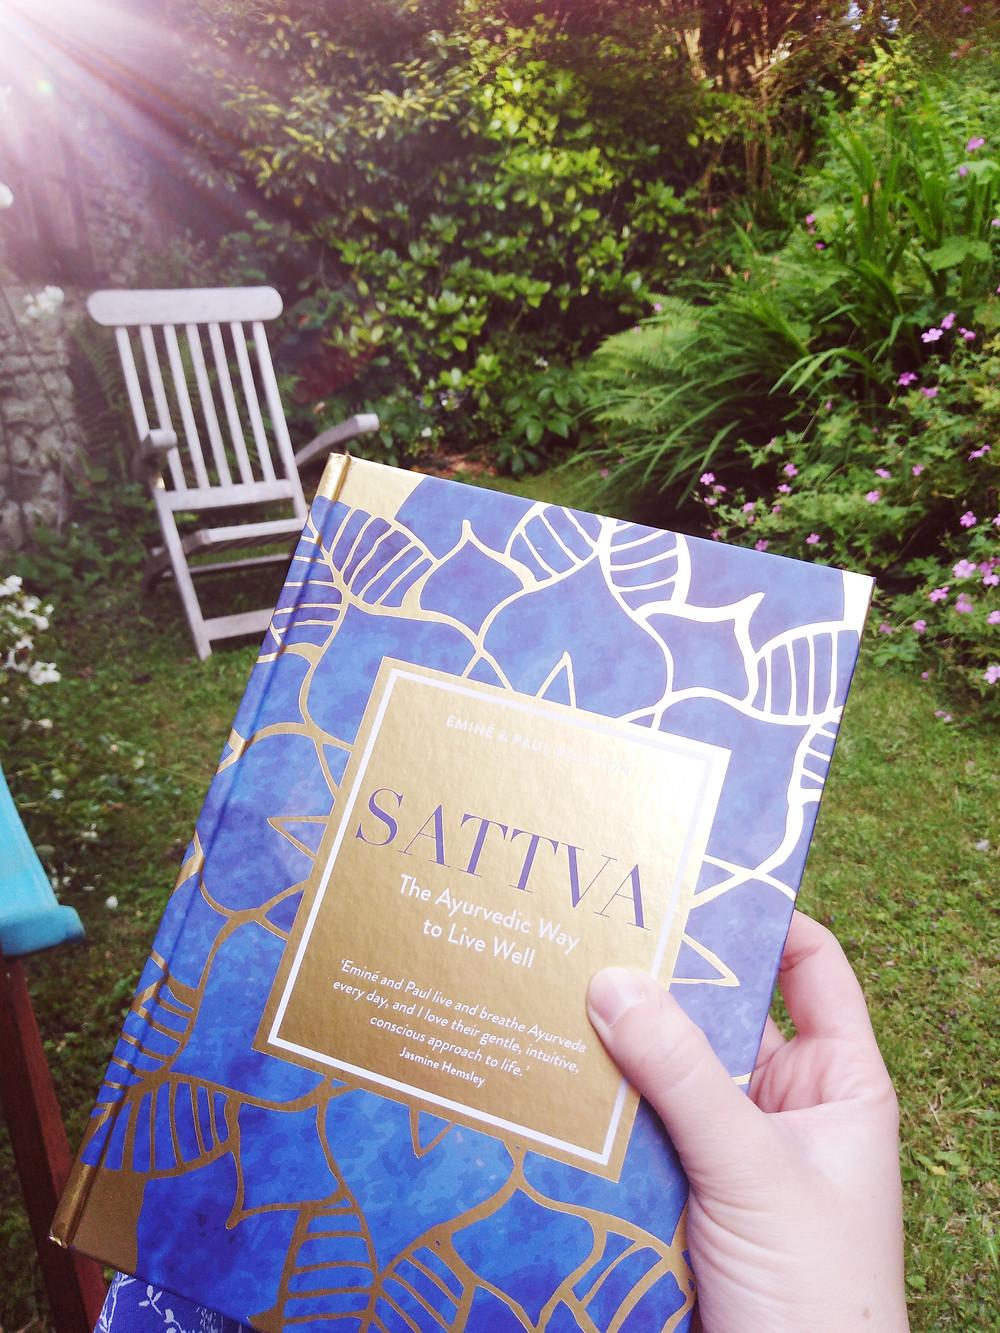 Sattva: The Ayurvedic Way to Live Well by Emine and Paul Rushton (Hay House UK Ltd, 2019)